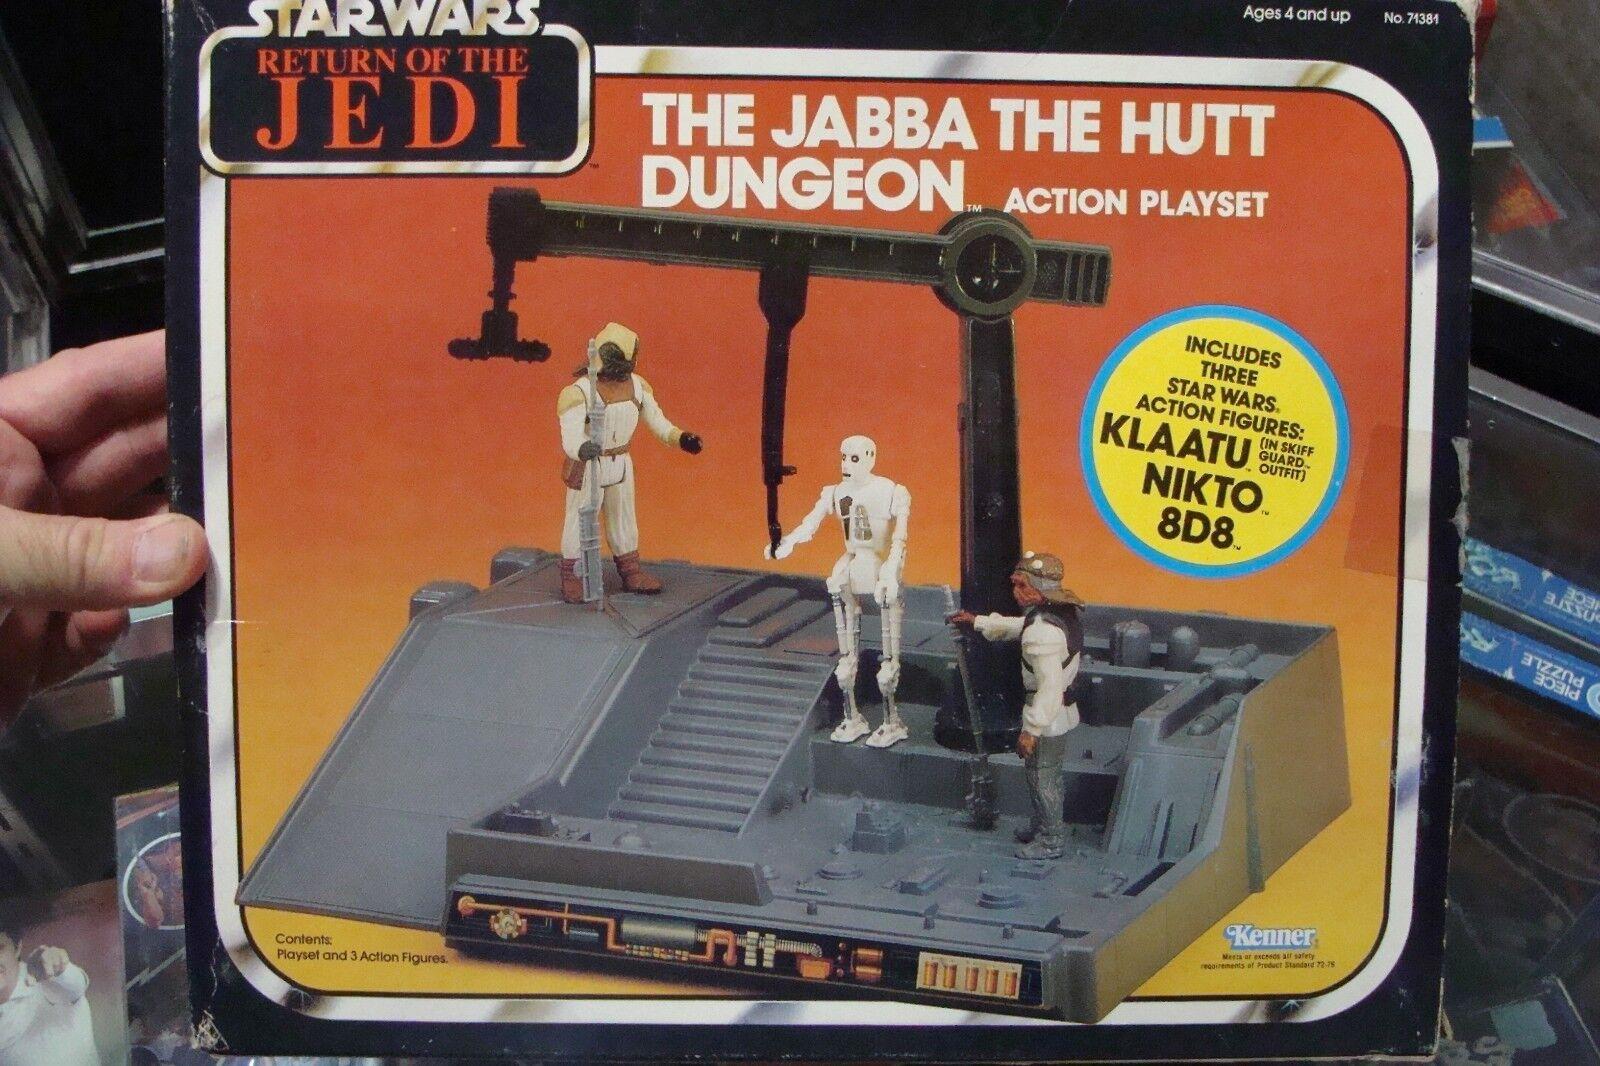 Star Wars THE JABBA THE HUTT DUNGEON Action PLAYSET Kenner 1983 HIGH GRADE jedi